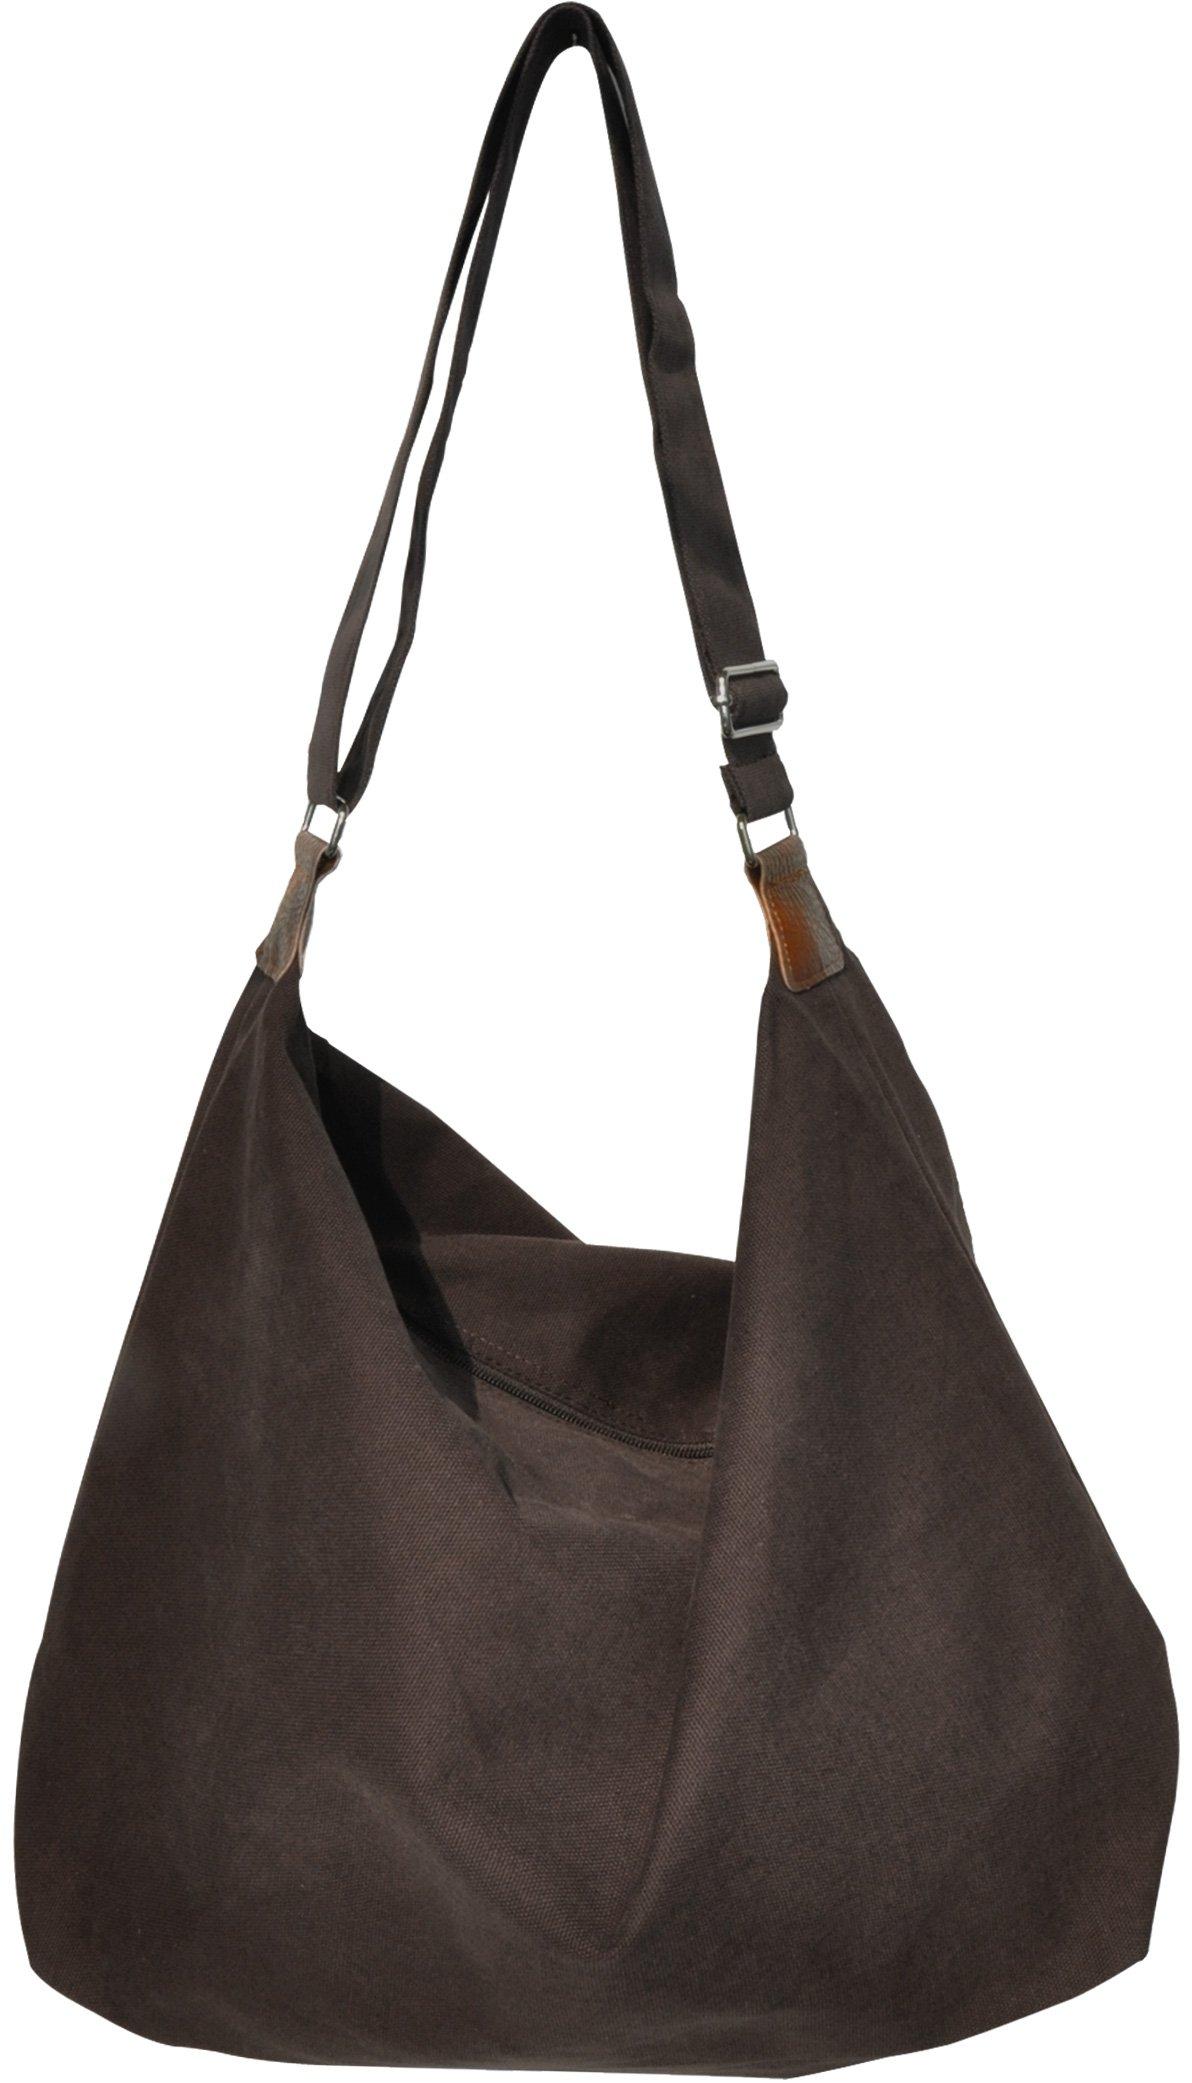 Unisex Hobo Style Casual Canvas Crossbody Shoulder Handbag, Oversized Fashion Bag[2way] (Sage hobo-brown)